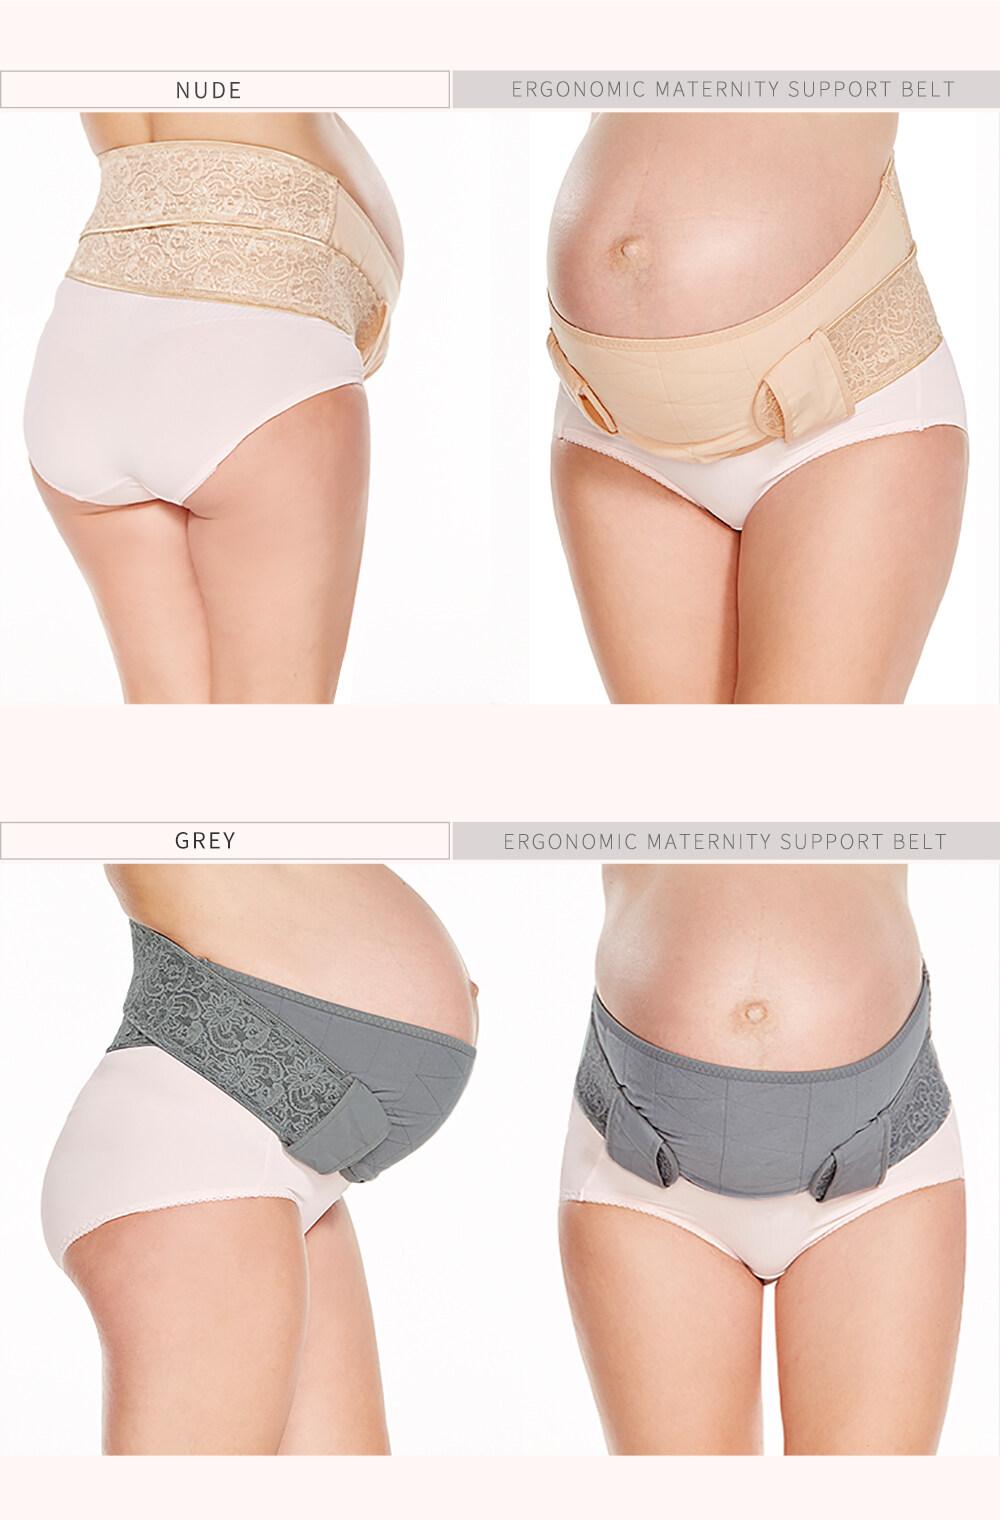 Mamaway Bundle 2pcs Ergonomic Maternity Support Belt Waist Back Spain Relief (Beige+Grey)